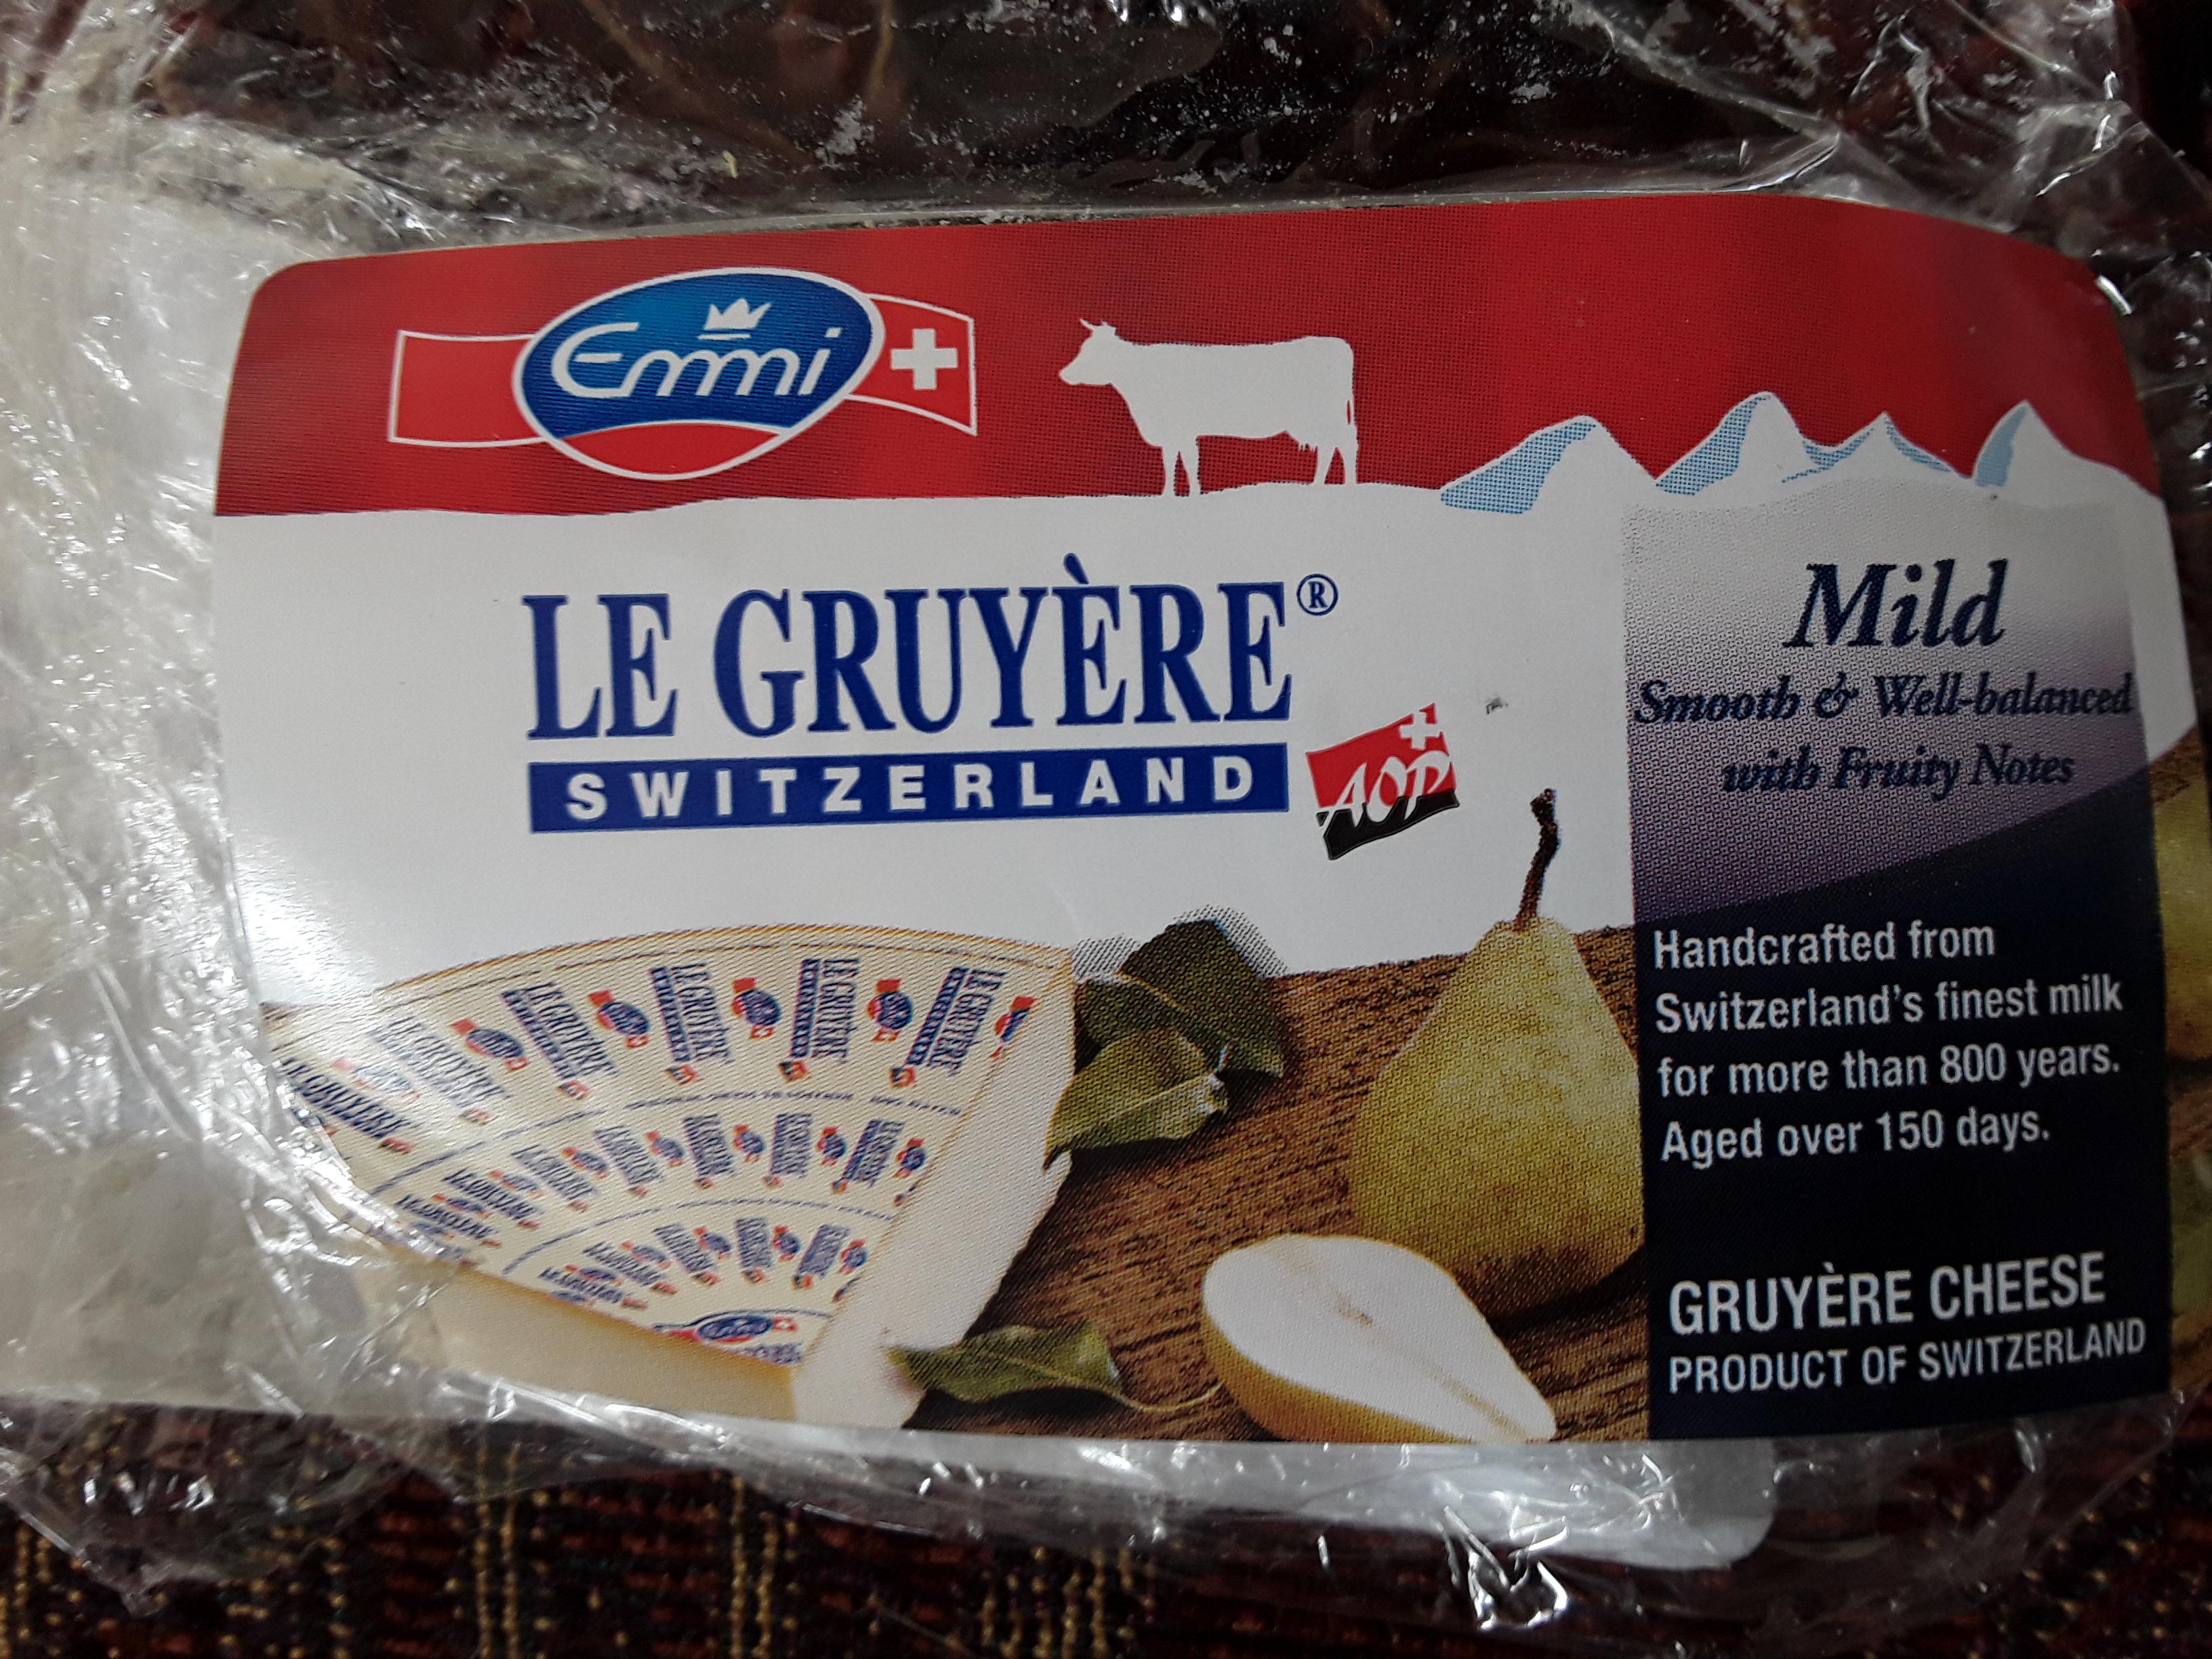 Emmi Le Gruyère